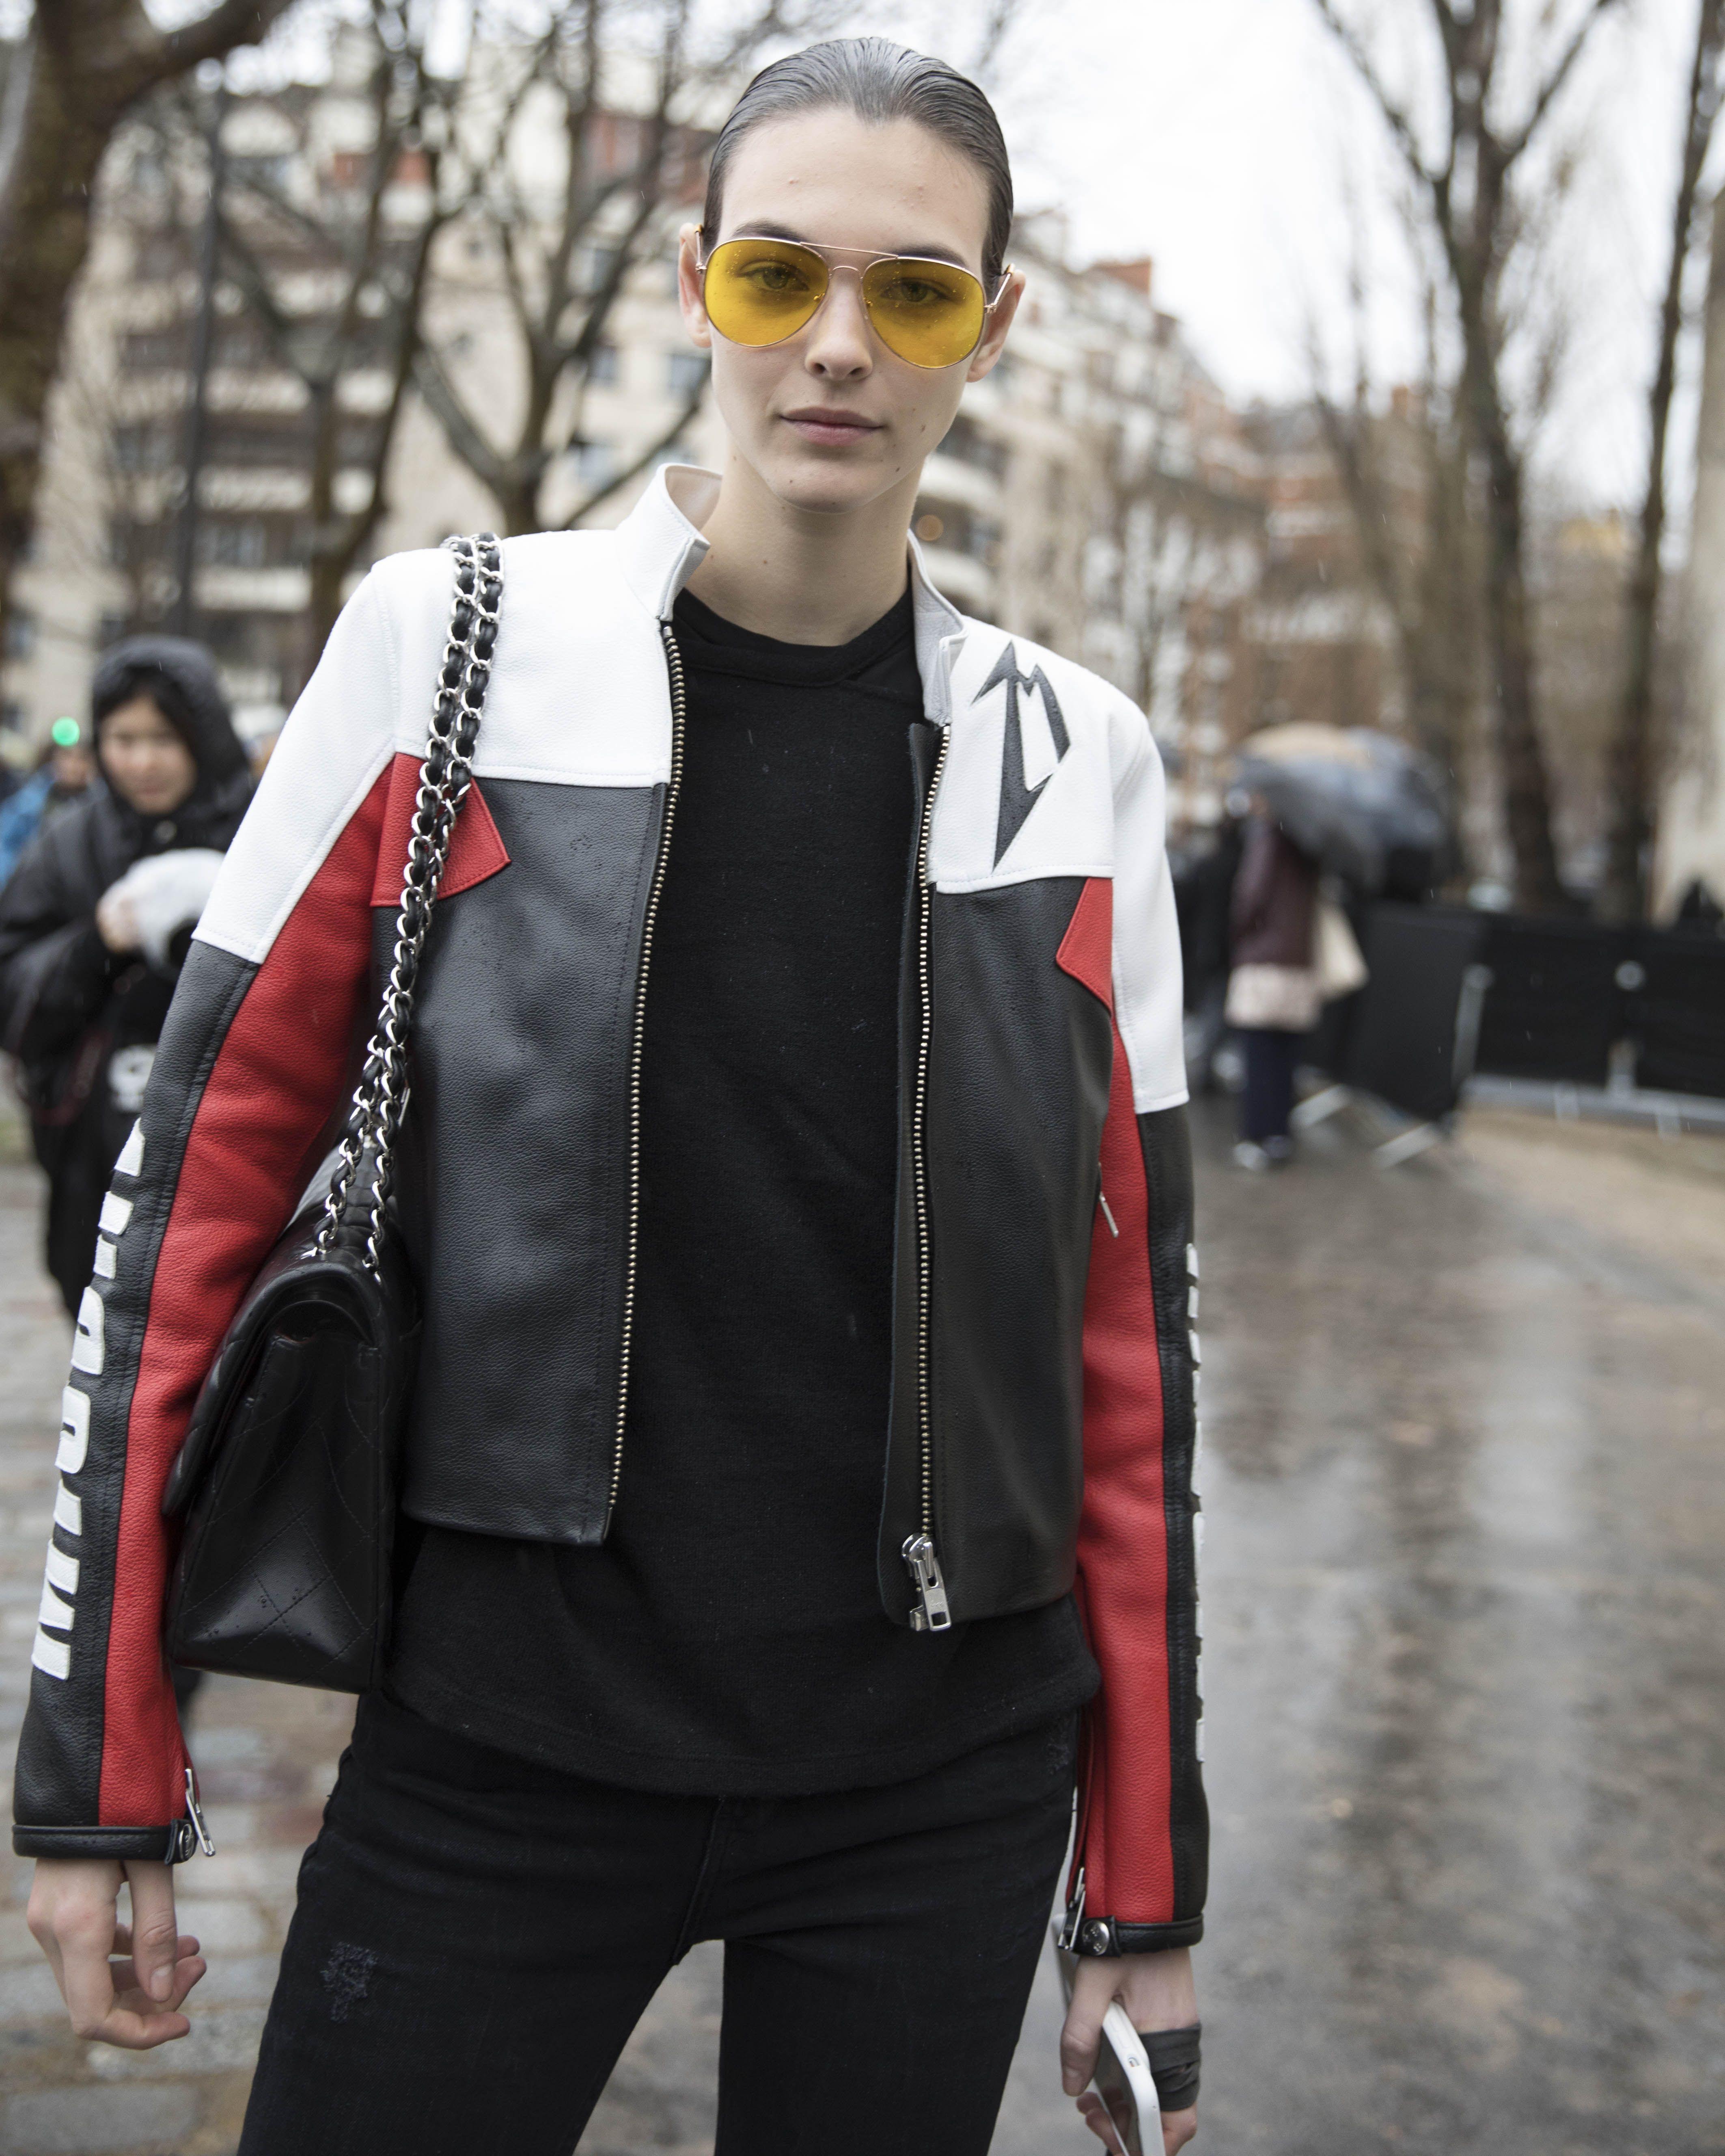 Street style, PFW, inverno 2018: dia 5 - Vogue | Streetstyle